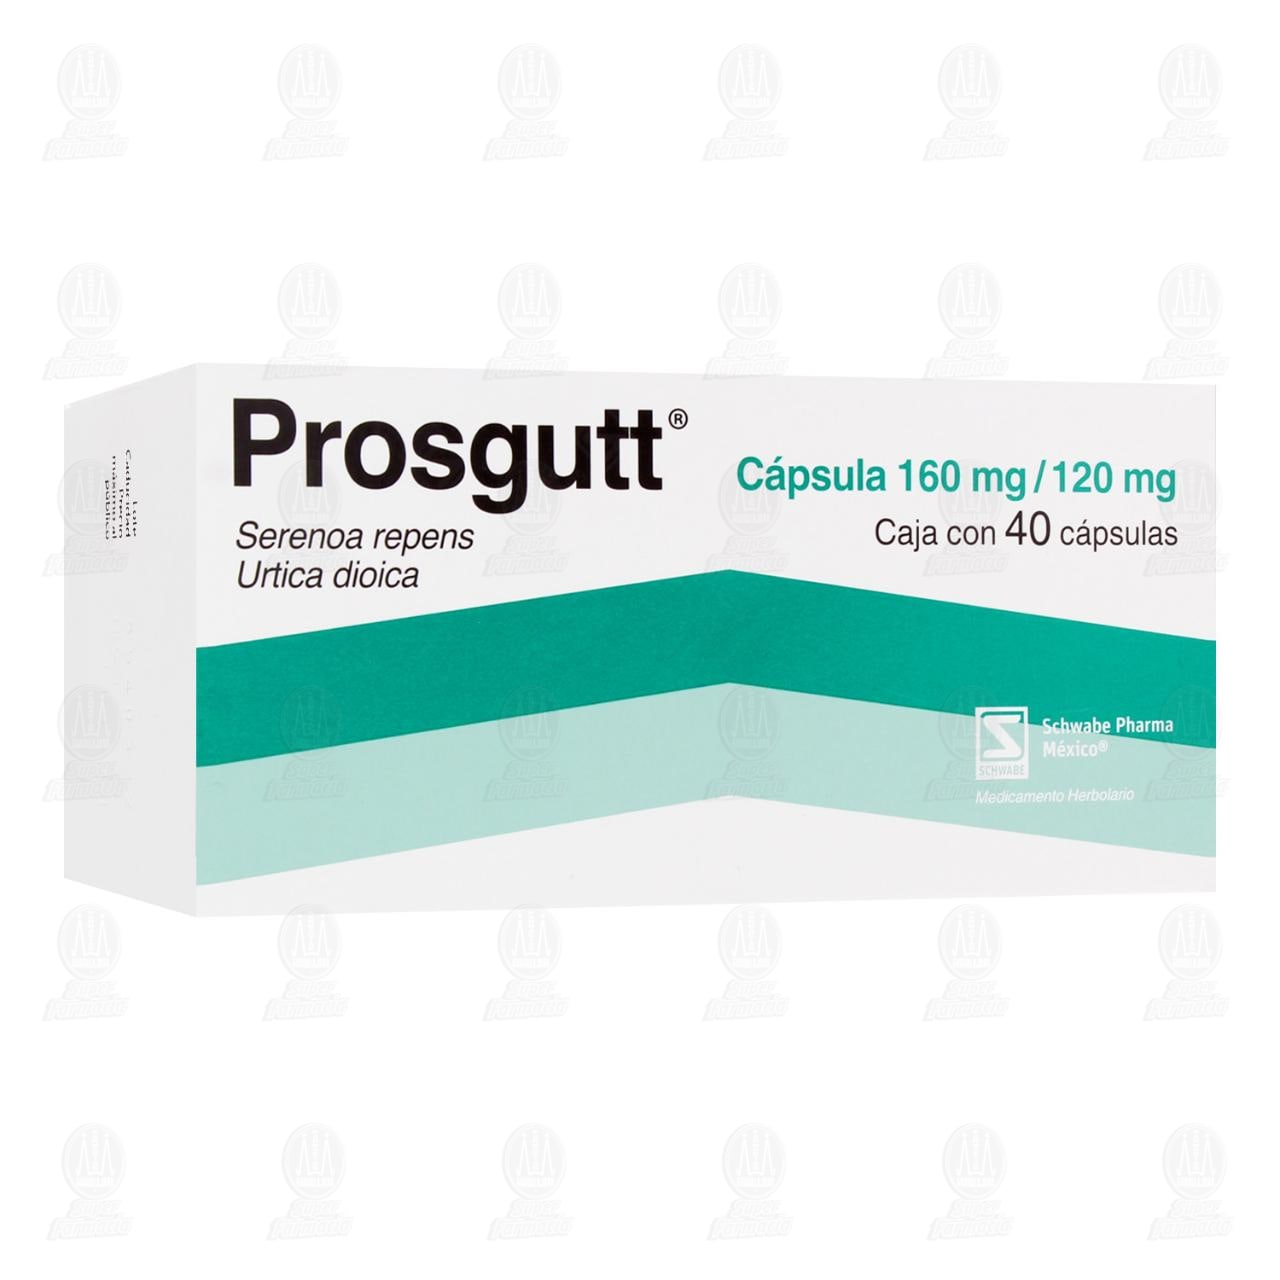 Comprar Prosgutt 160mg/120mg 40 Cápsulas en Farmacias Guadalajara